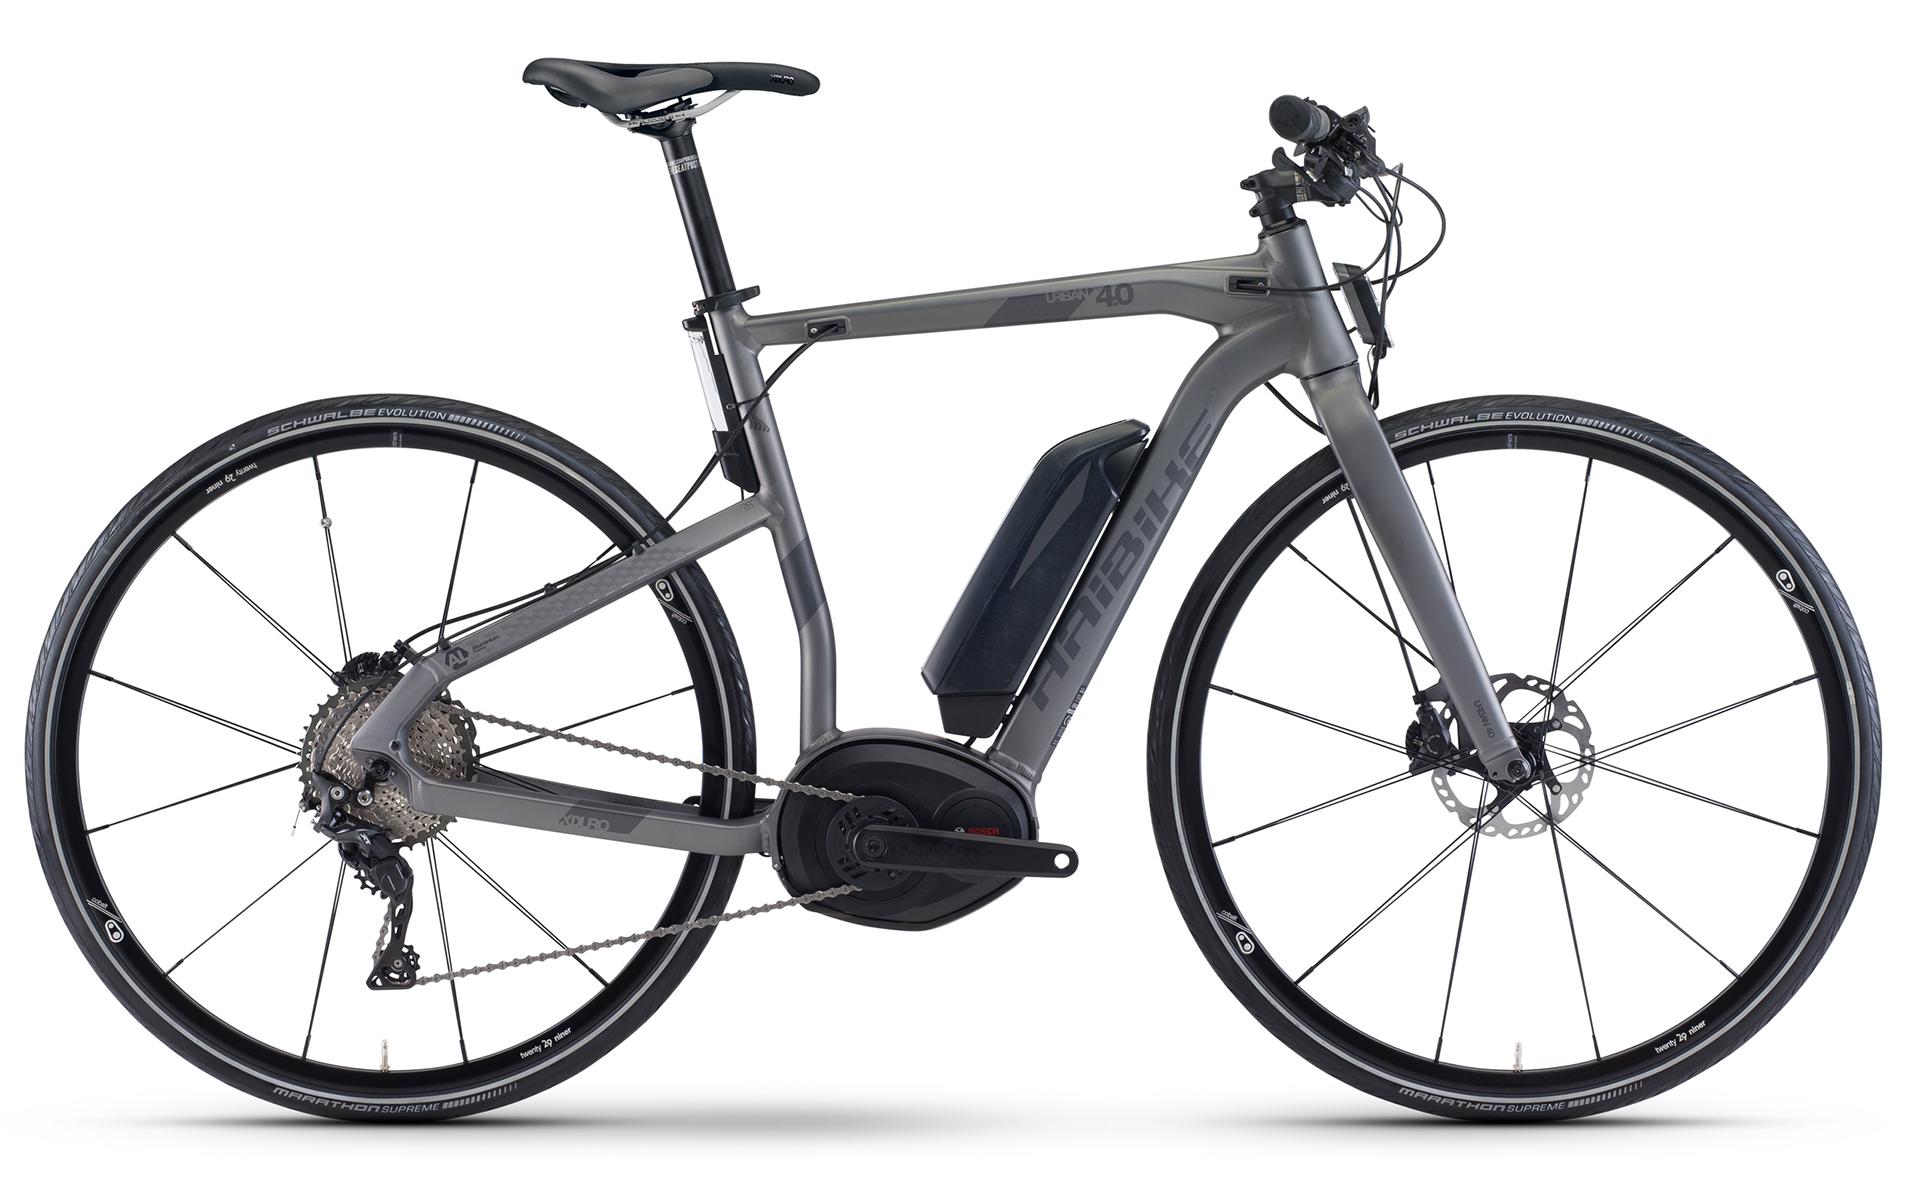 Haibike Xduro Urban 4.0 E-Bike 700c Shimano Déore XT 11S